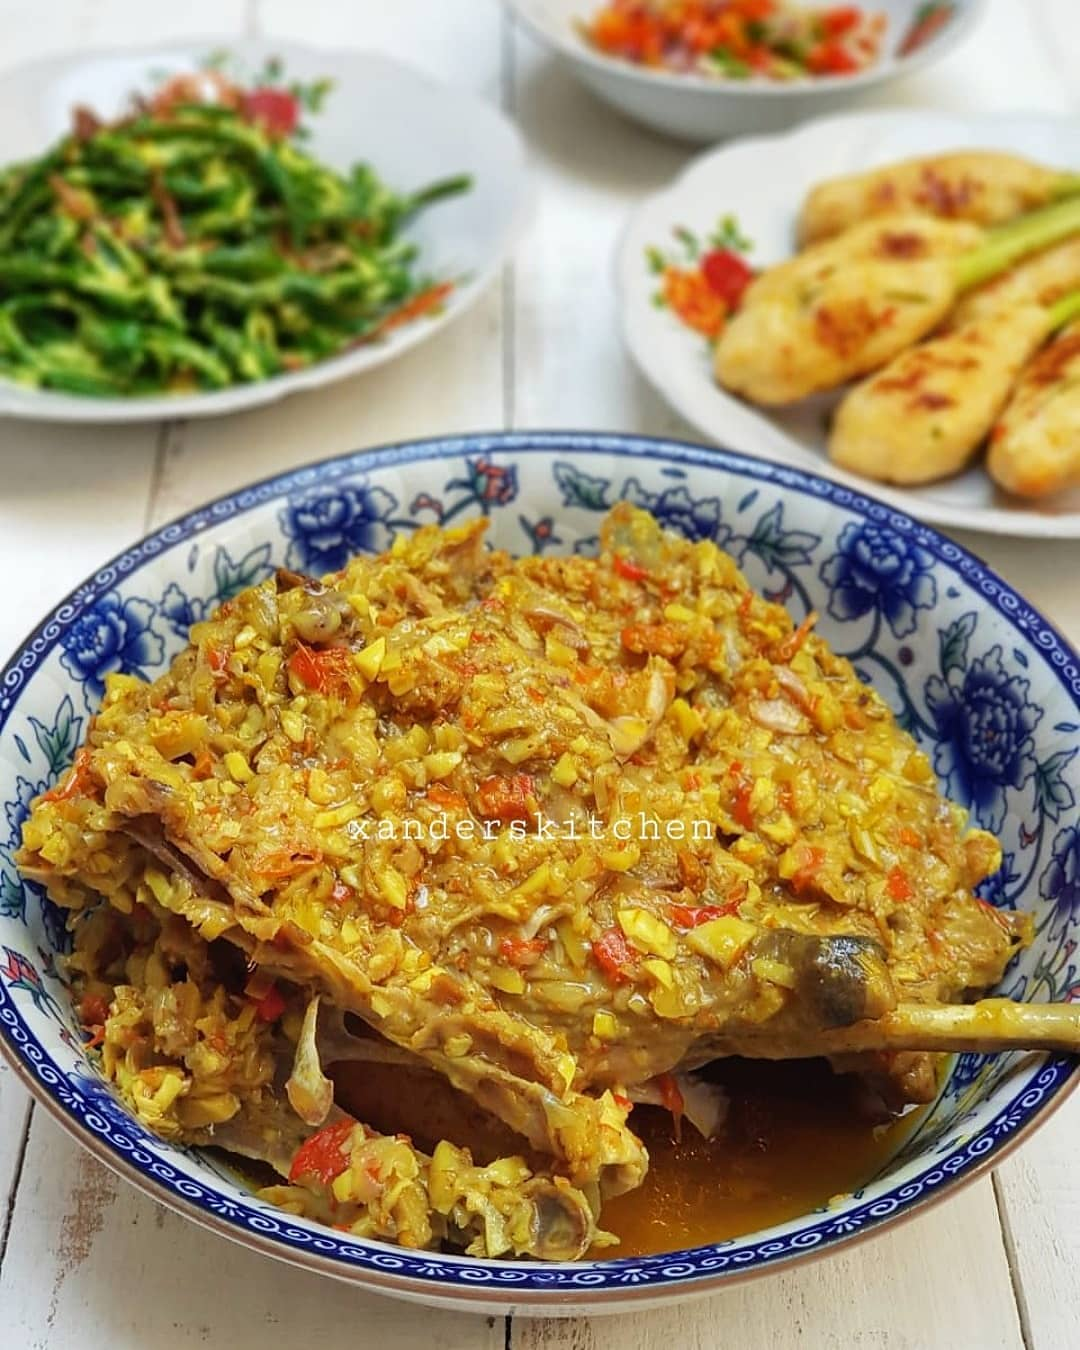 Resep Masakan Ayam Betutu Ala Rumahan Yang Enak Lezat Nikmat Mudah Dan Sederhana Resep Kue Dan Masakan